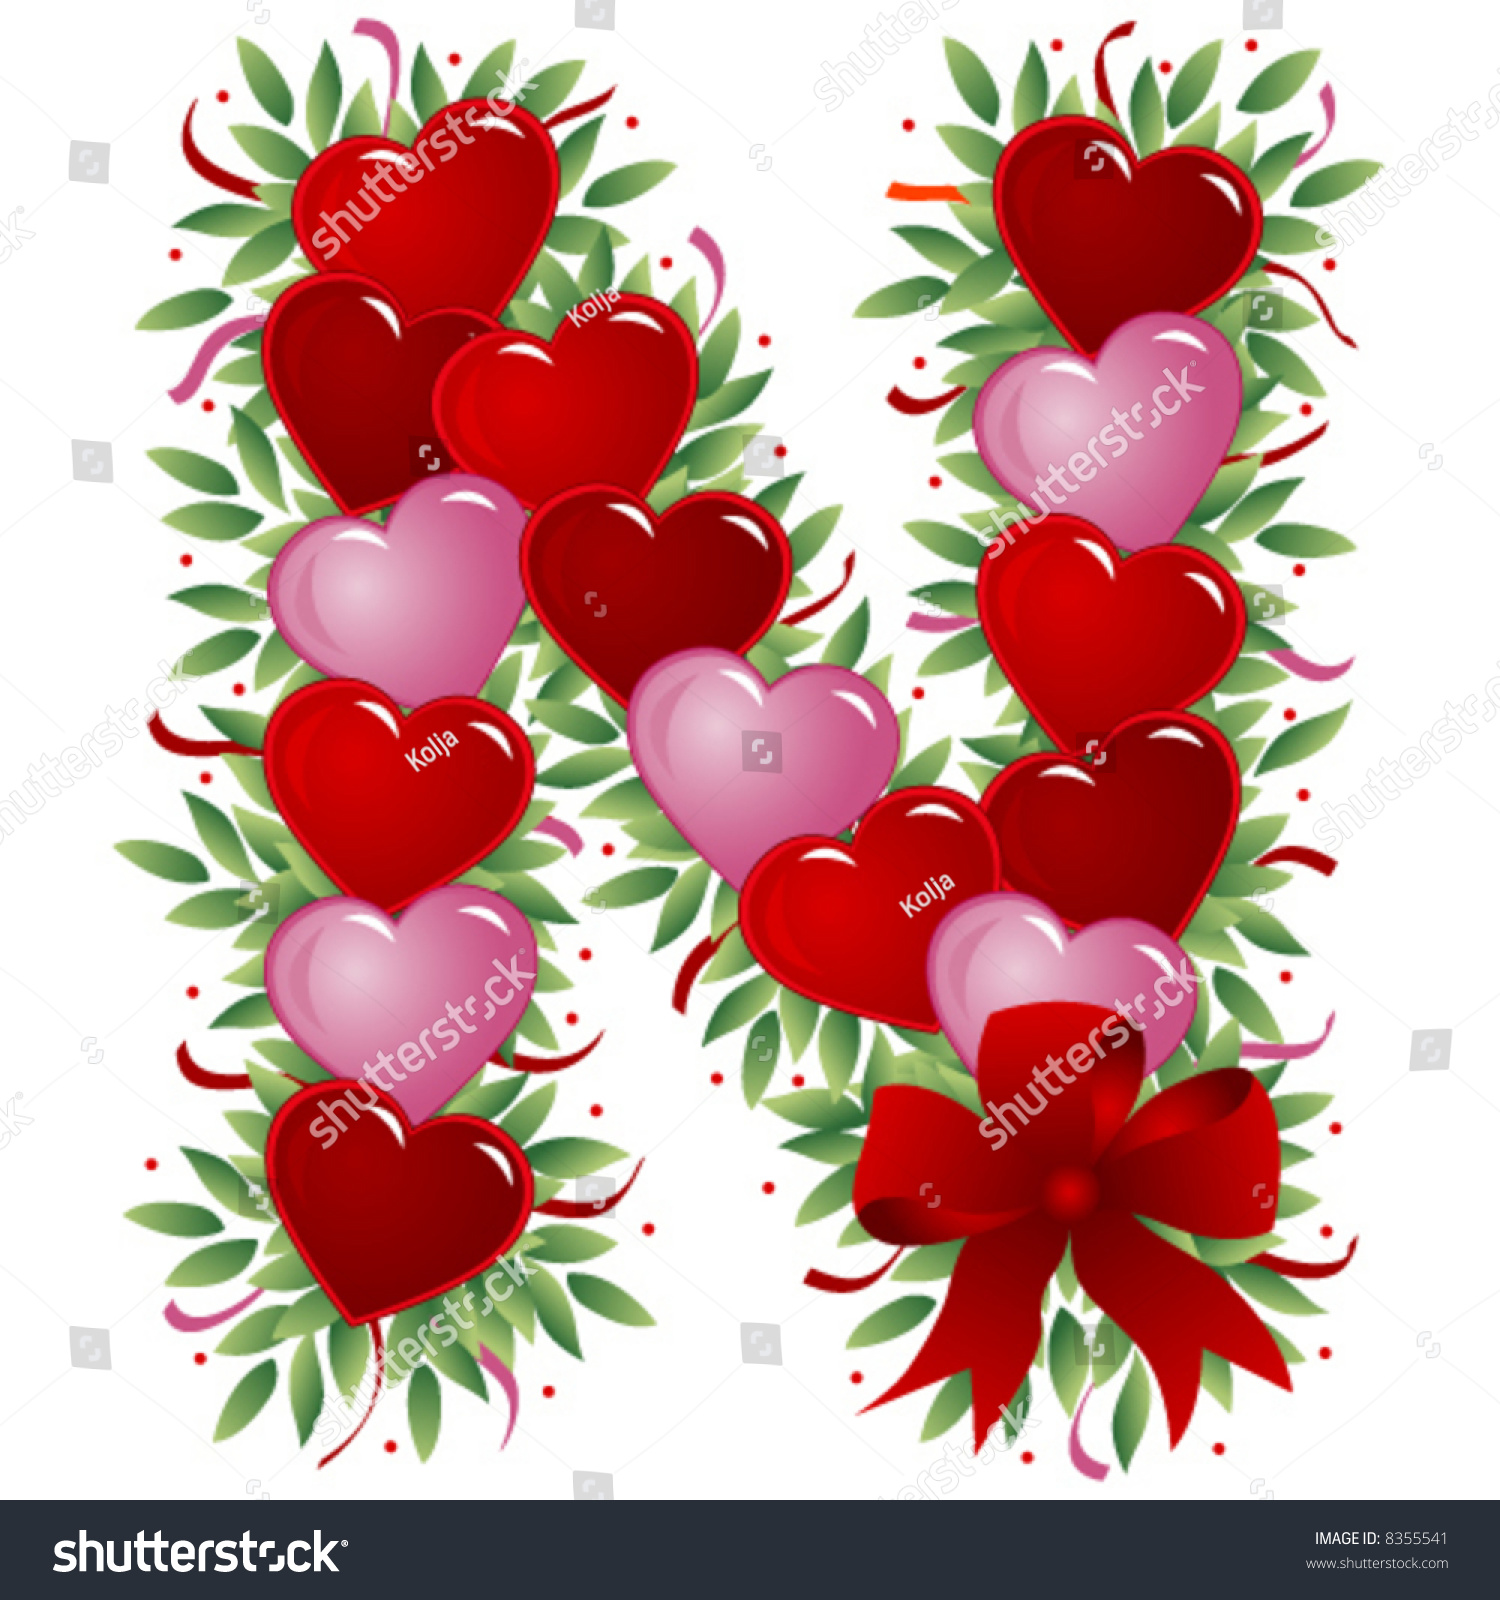 Alphabet Heart Love wallpapers  Free Wallpaper Download